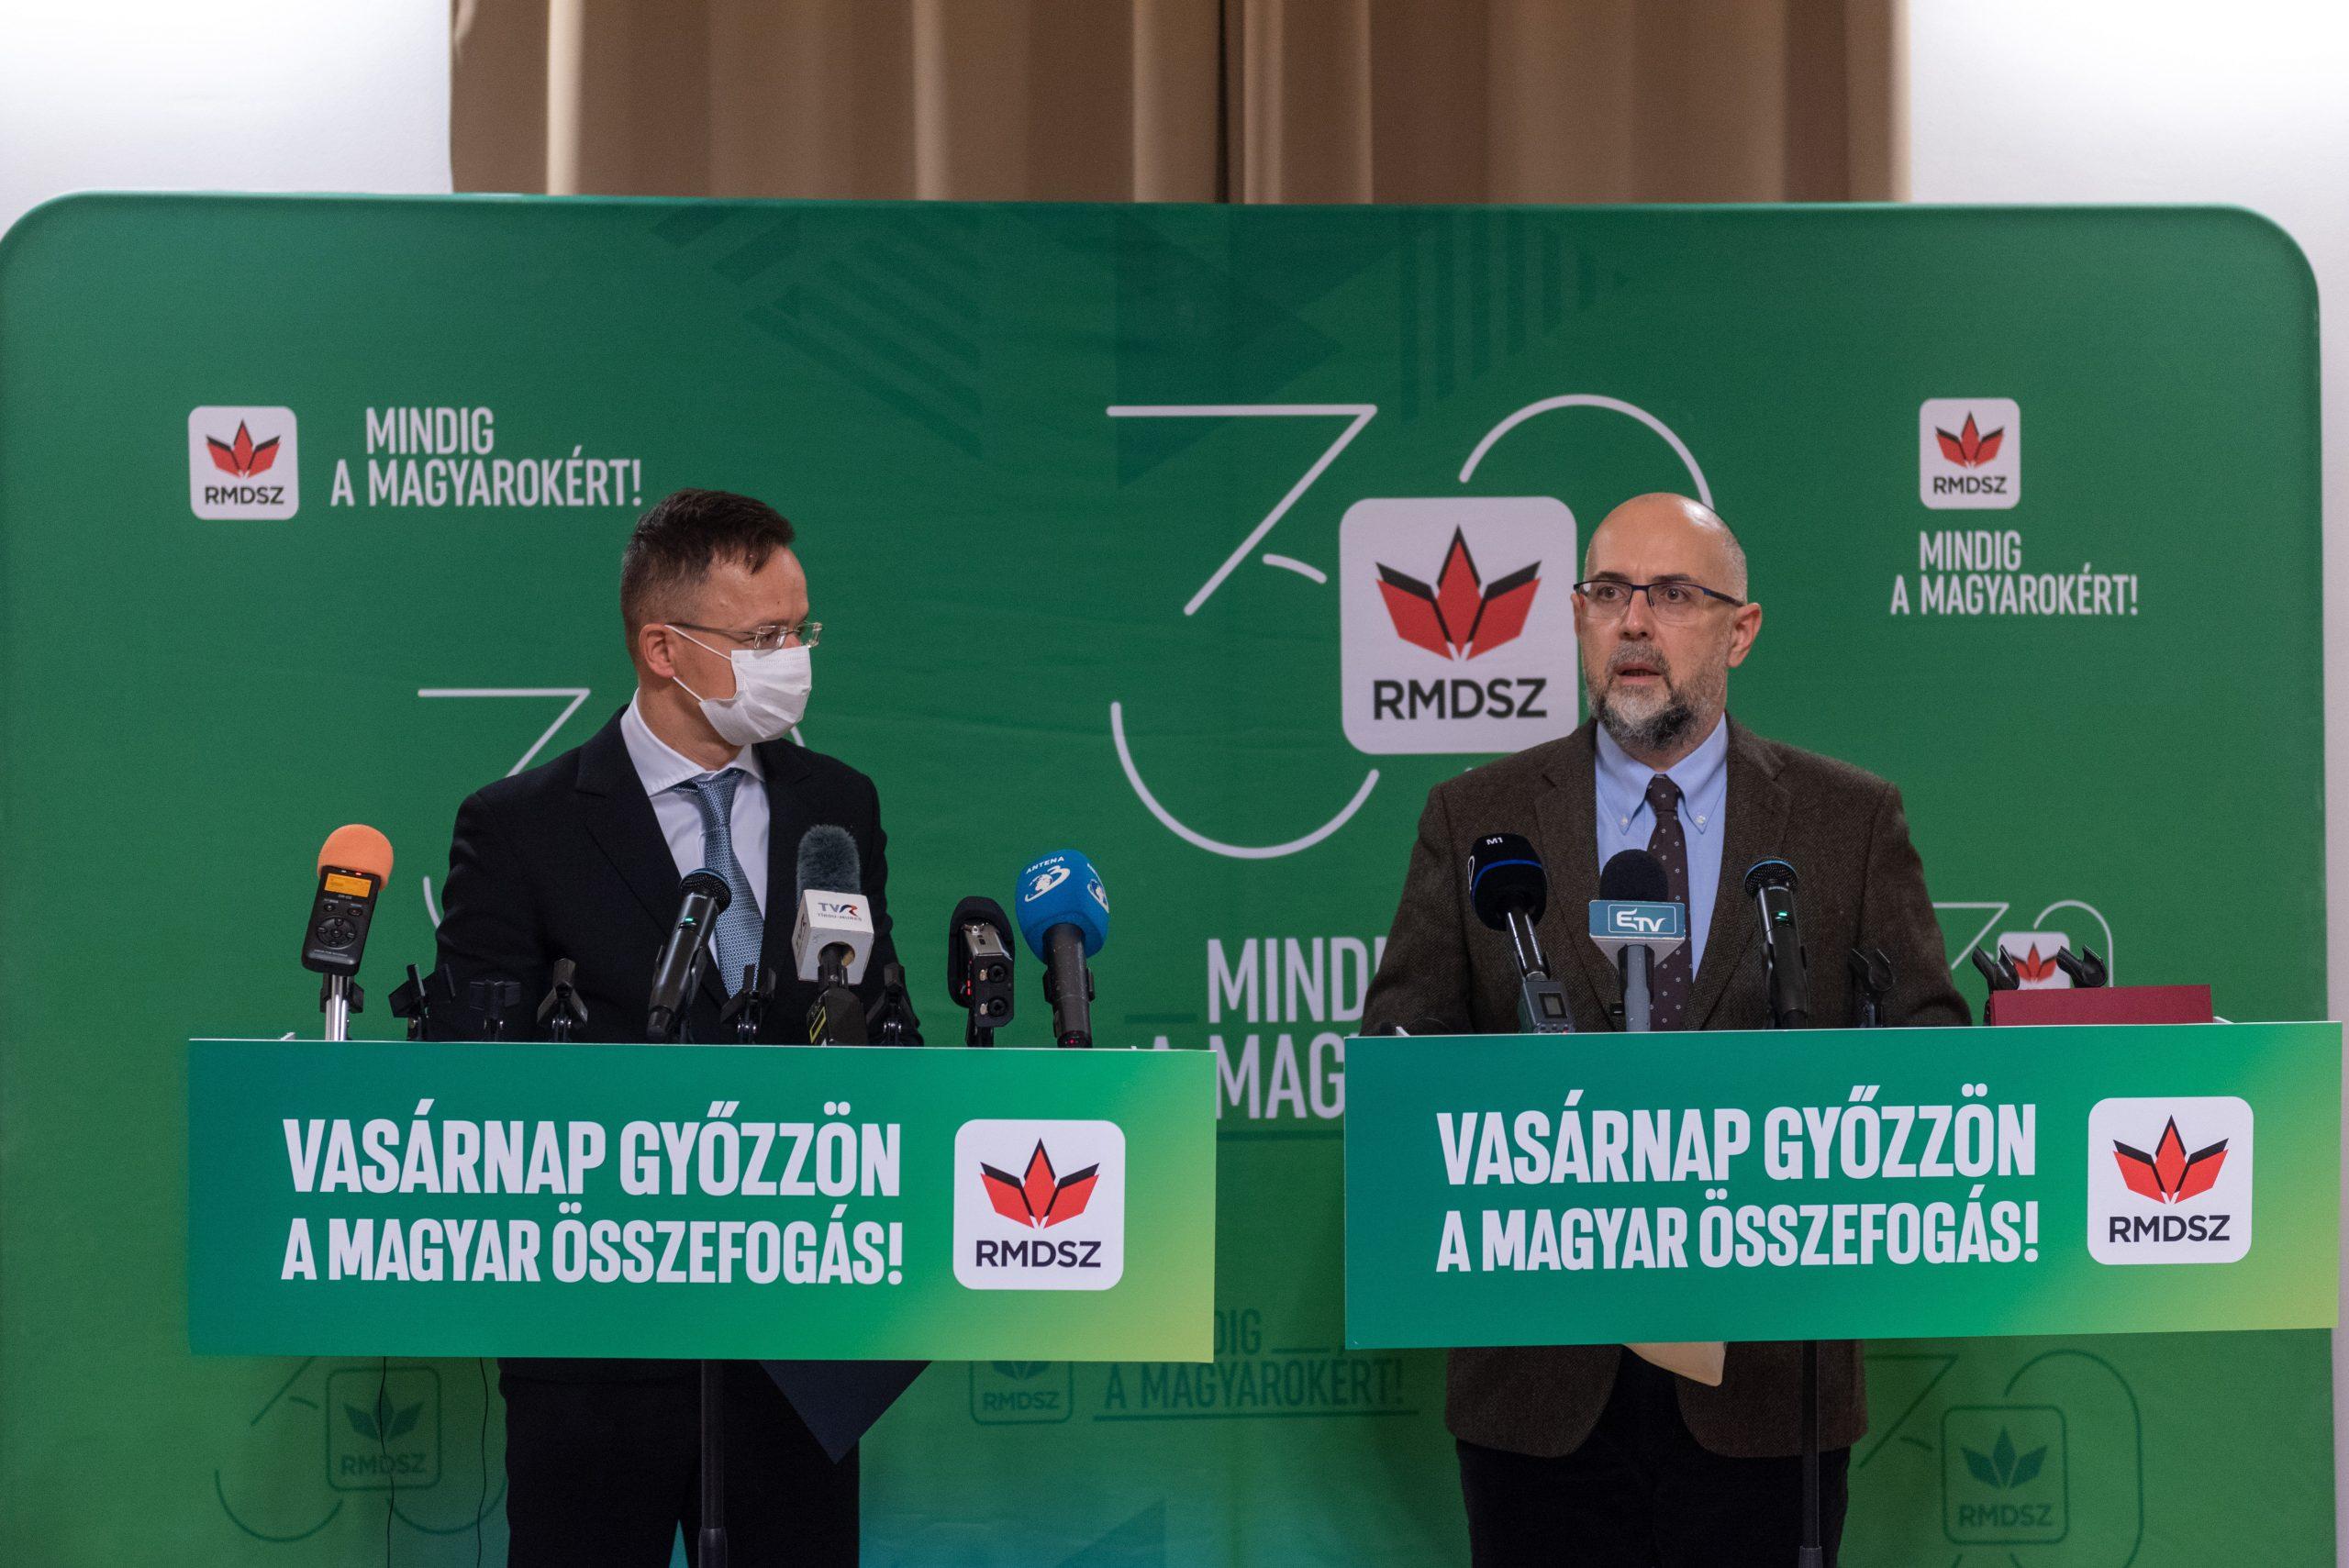 FM Szijjártó: Stronger RMDSZ Presence in Romania Parlt Would Help Bilateral Ties